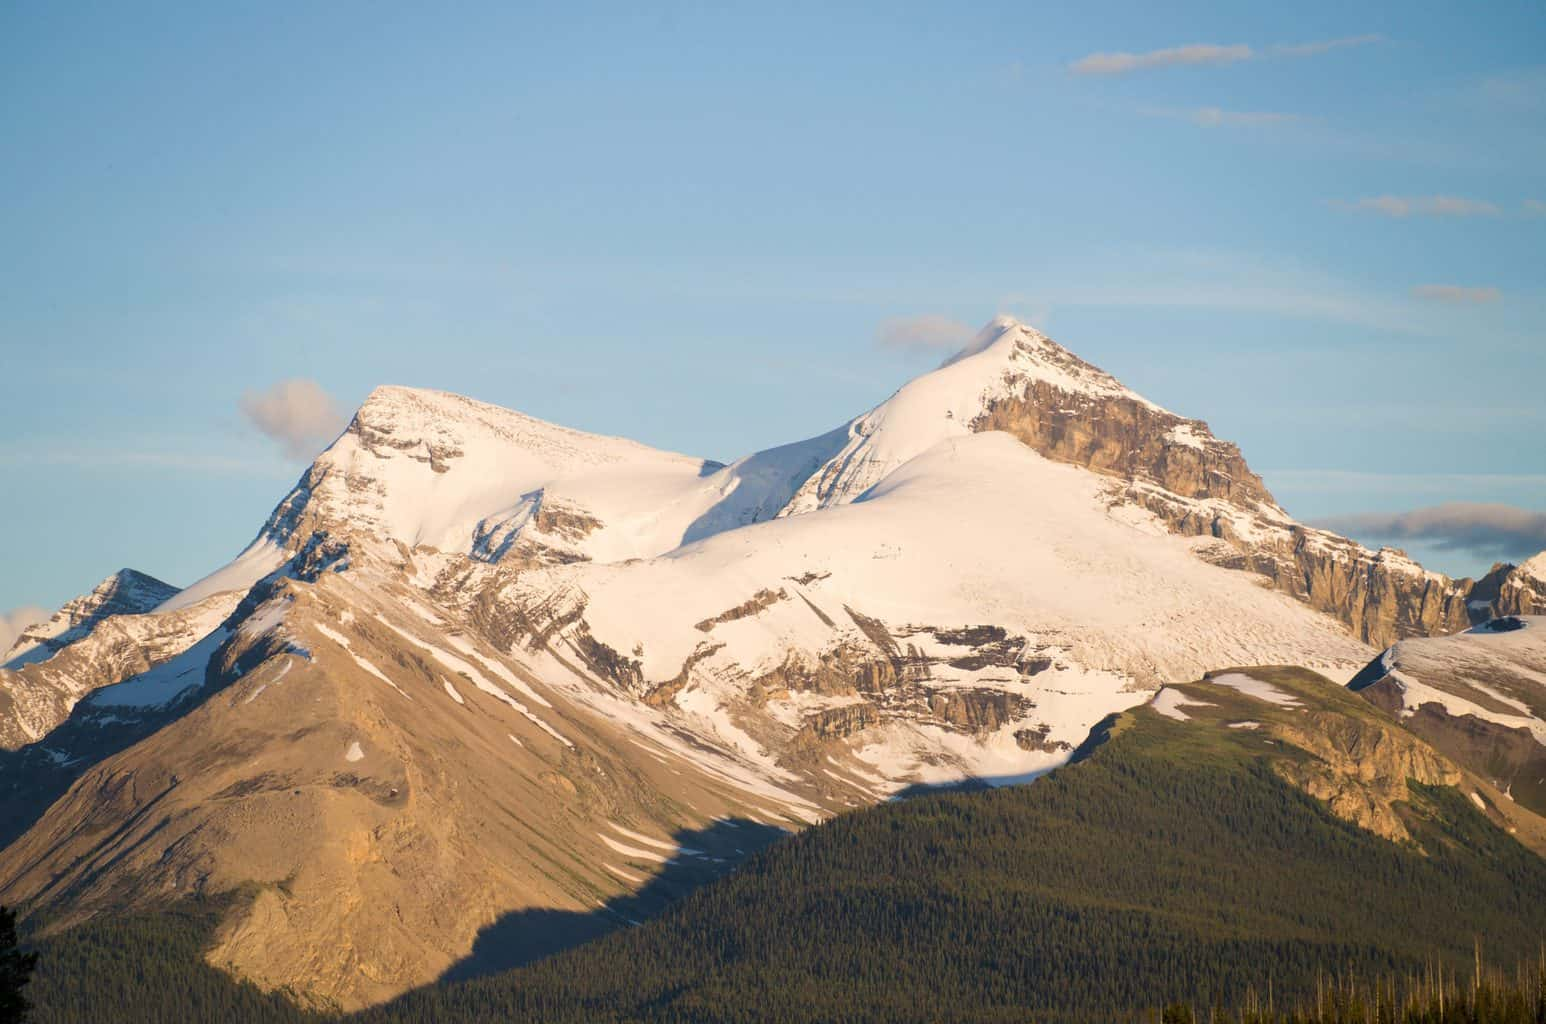 Mountain View on Jasper Road Trip To Maligne Lake